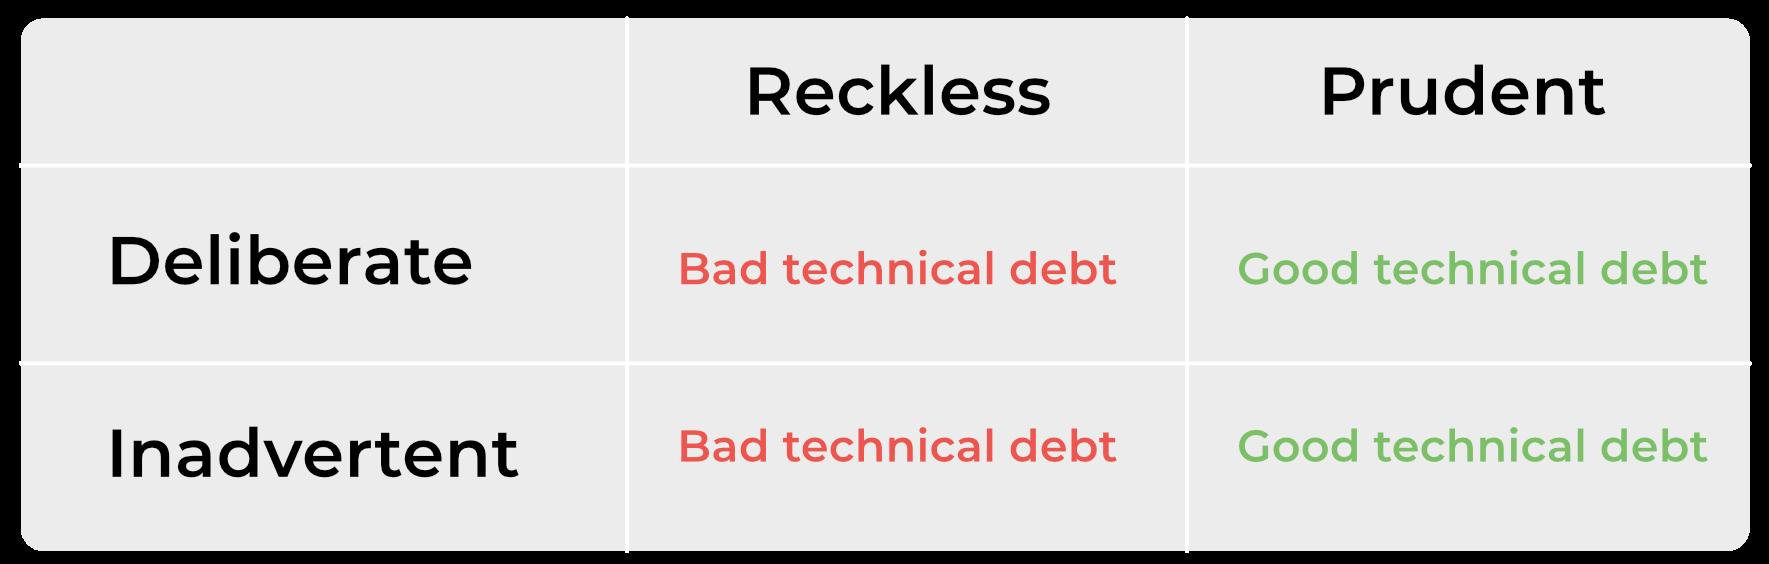 good technical debt bad technical debt